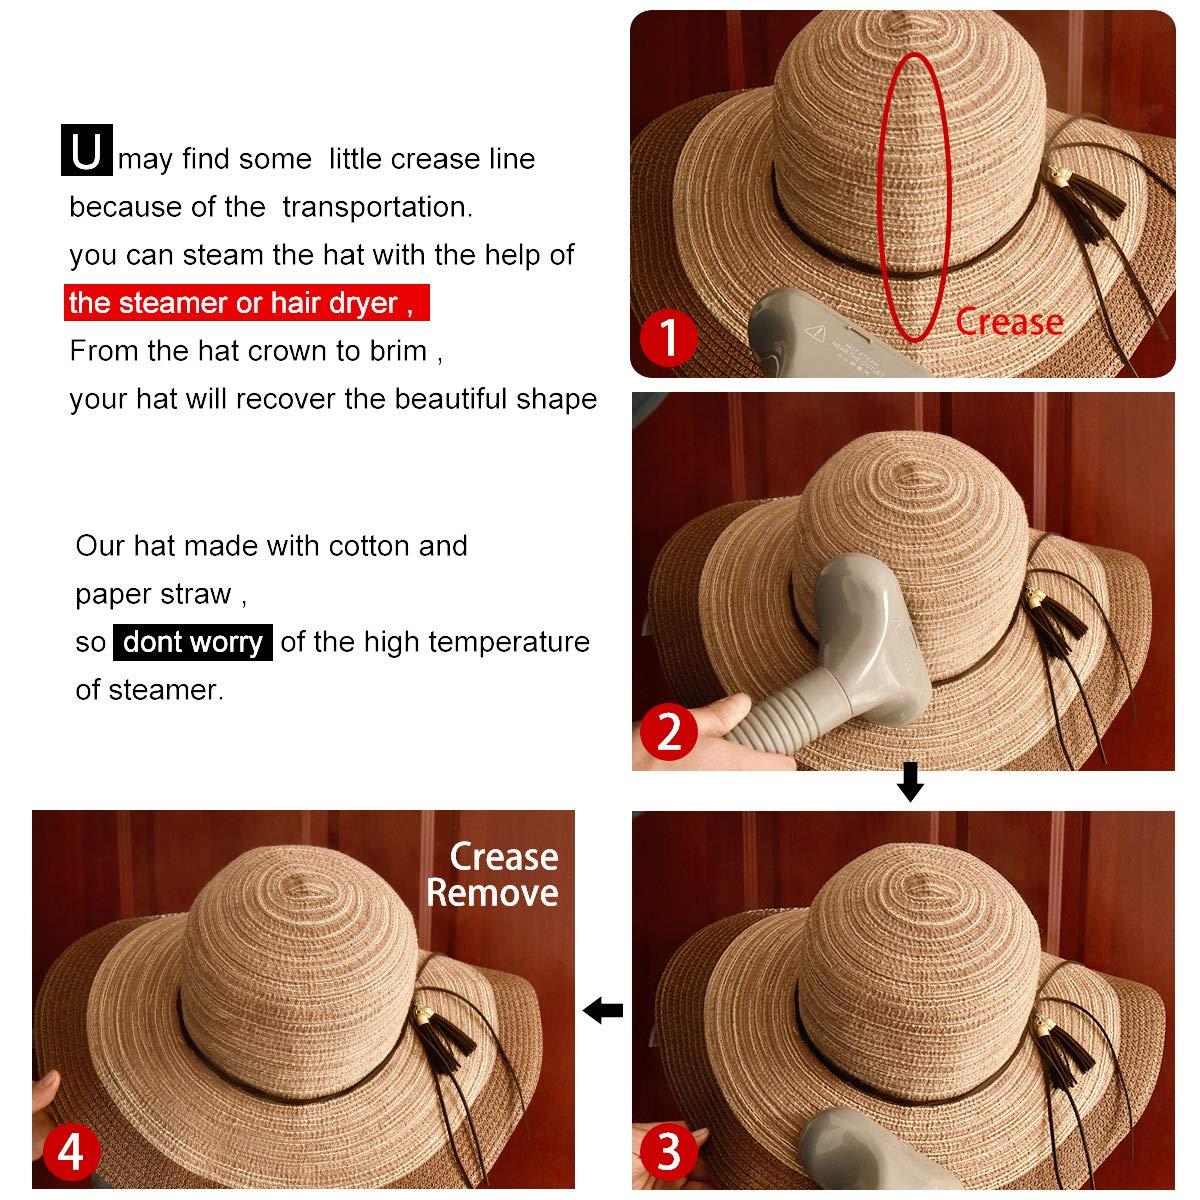 SOMALER Women Floppy Sun Hat Summer Wide Brim Beach Cap Packable Cotton Straw Hat for Travel by SOMALER (Image #7)